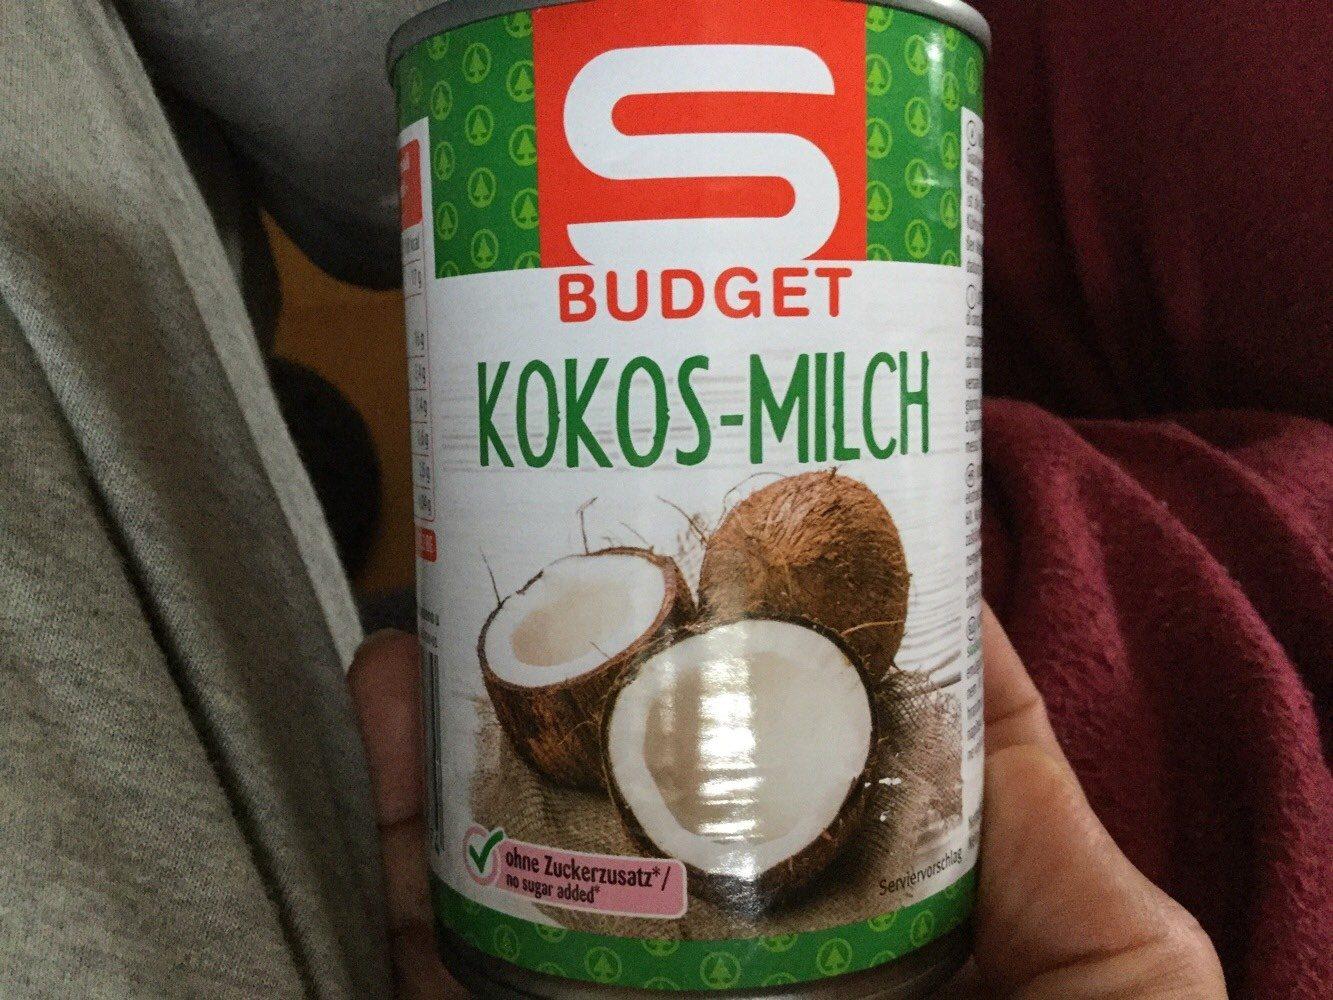 Kokos-Milch S-Budget - Produkt - en